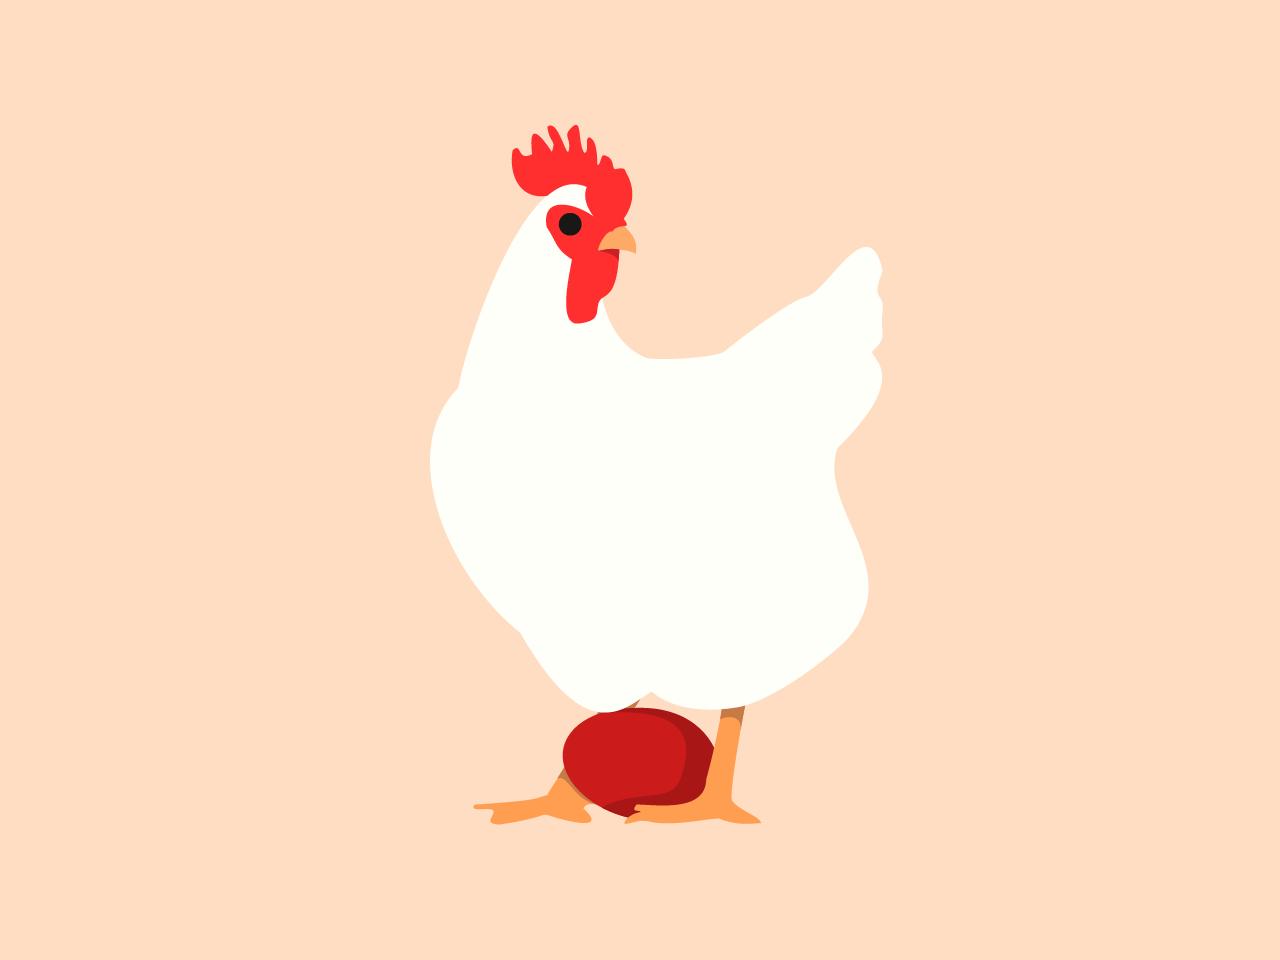 Chicken Surprise birb white red illustration vector bird minimalistic red egg egg easter hen rooster chicken